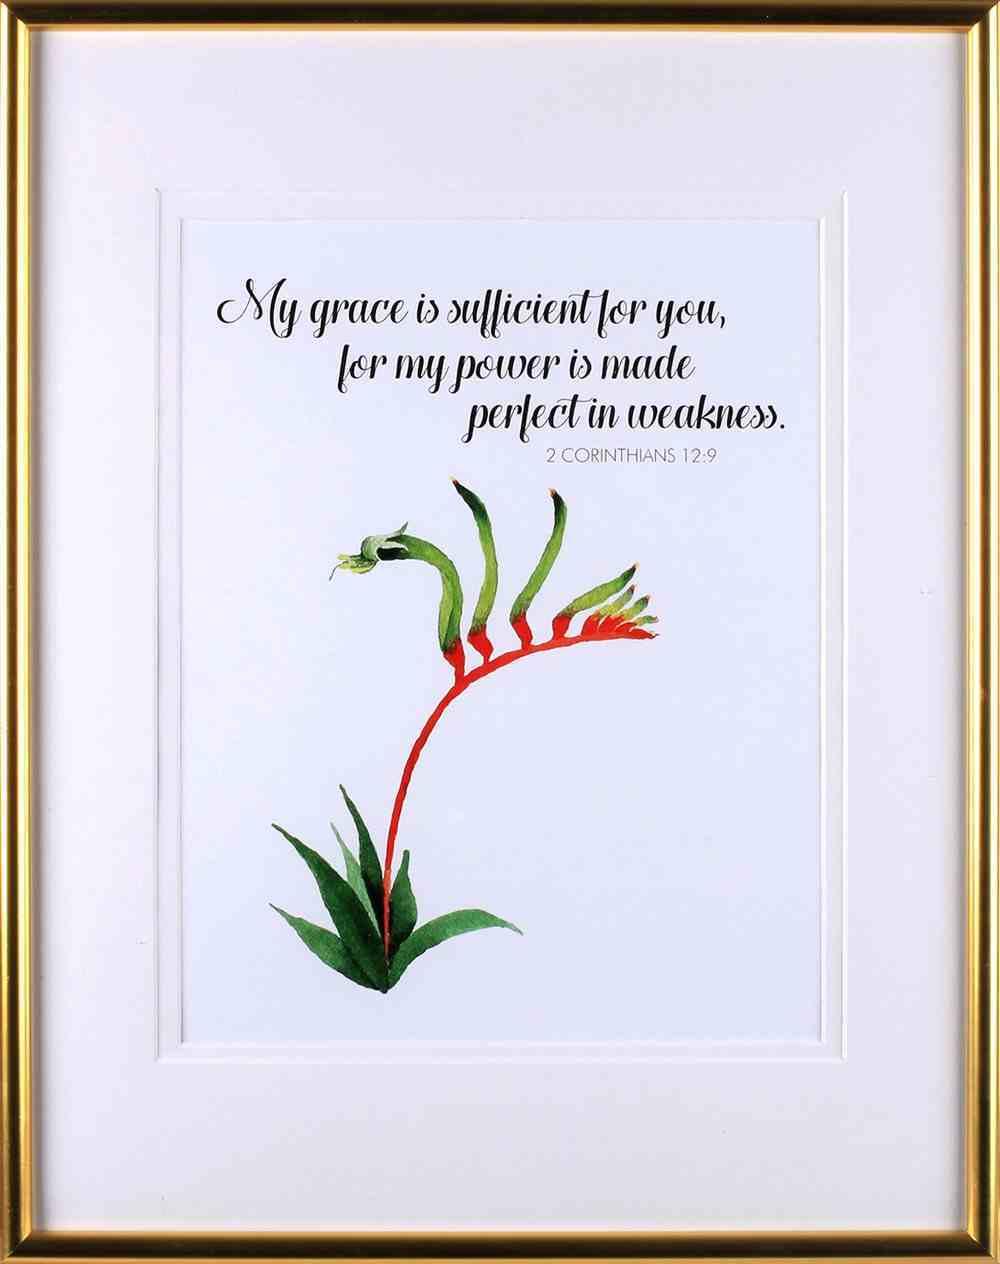 Medium Gold Framed Print: Australian Native Kangaroo Paw Flower, 2 Corinthians 12:9 Plaque